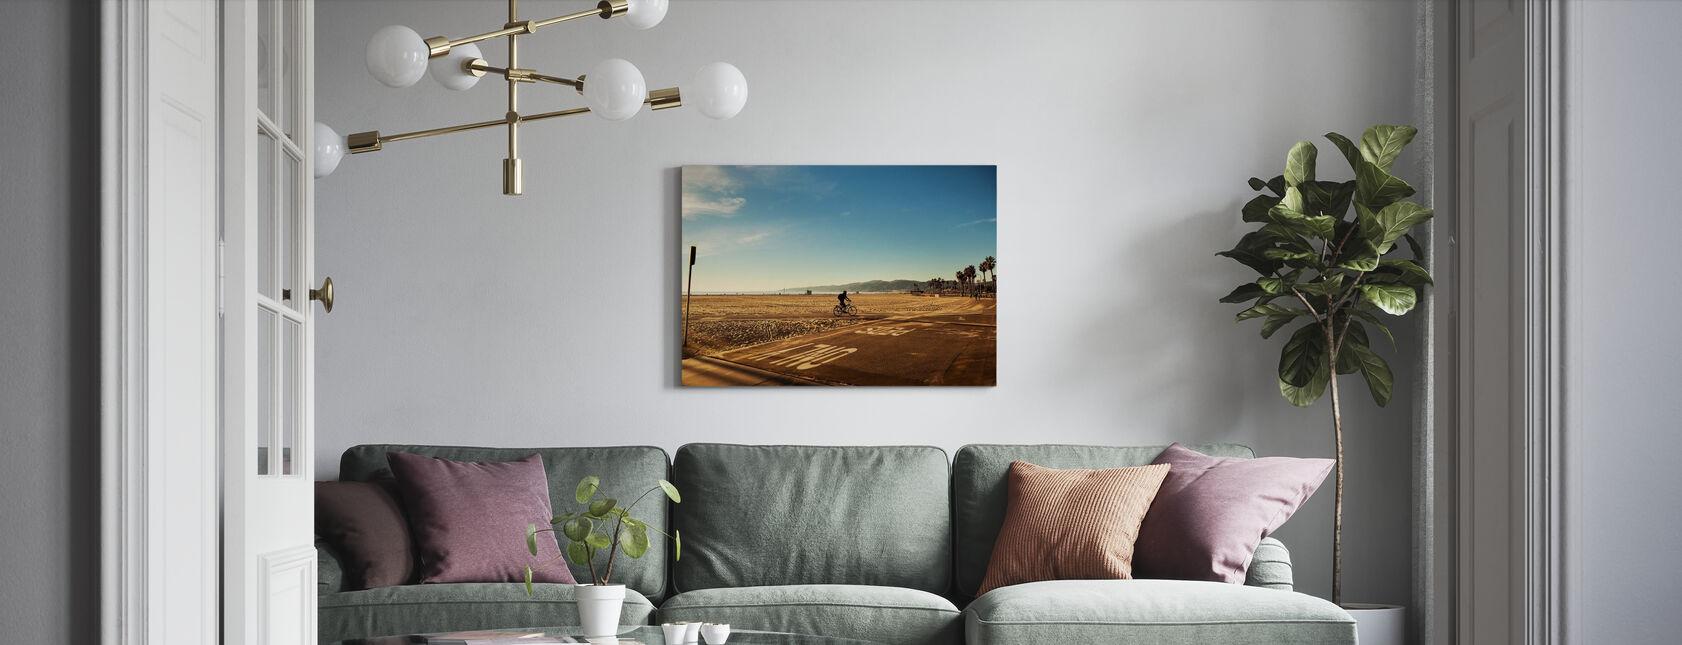 Venice Beach, Los Angeles - Canvas print - Living Room